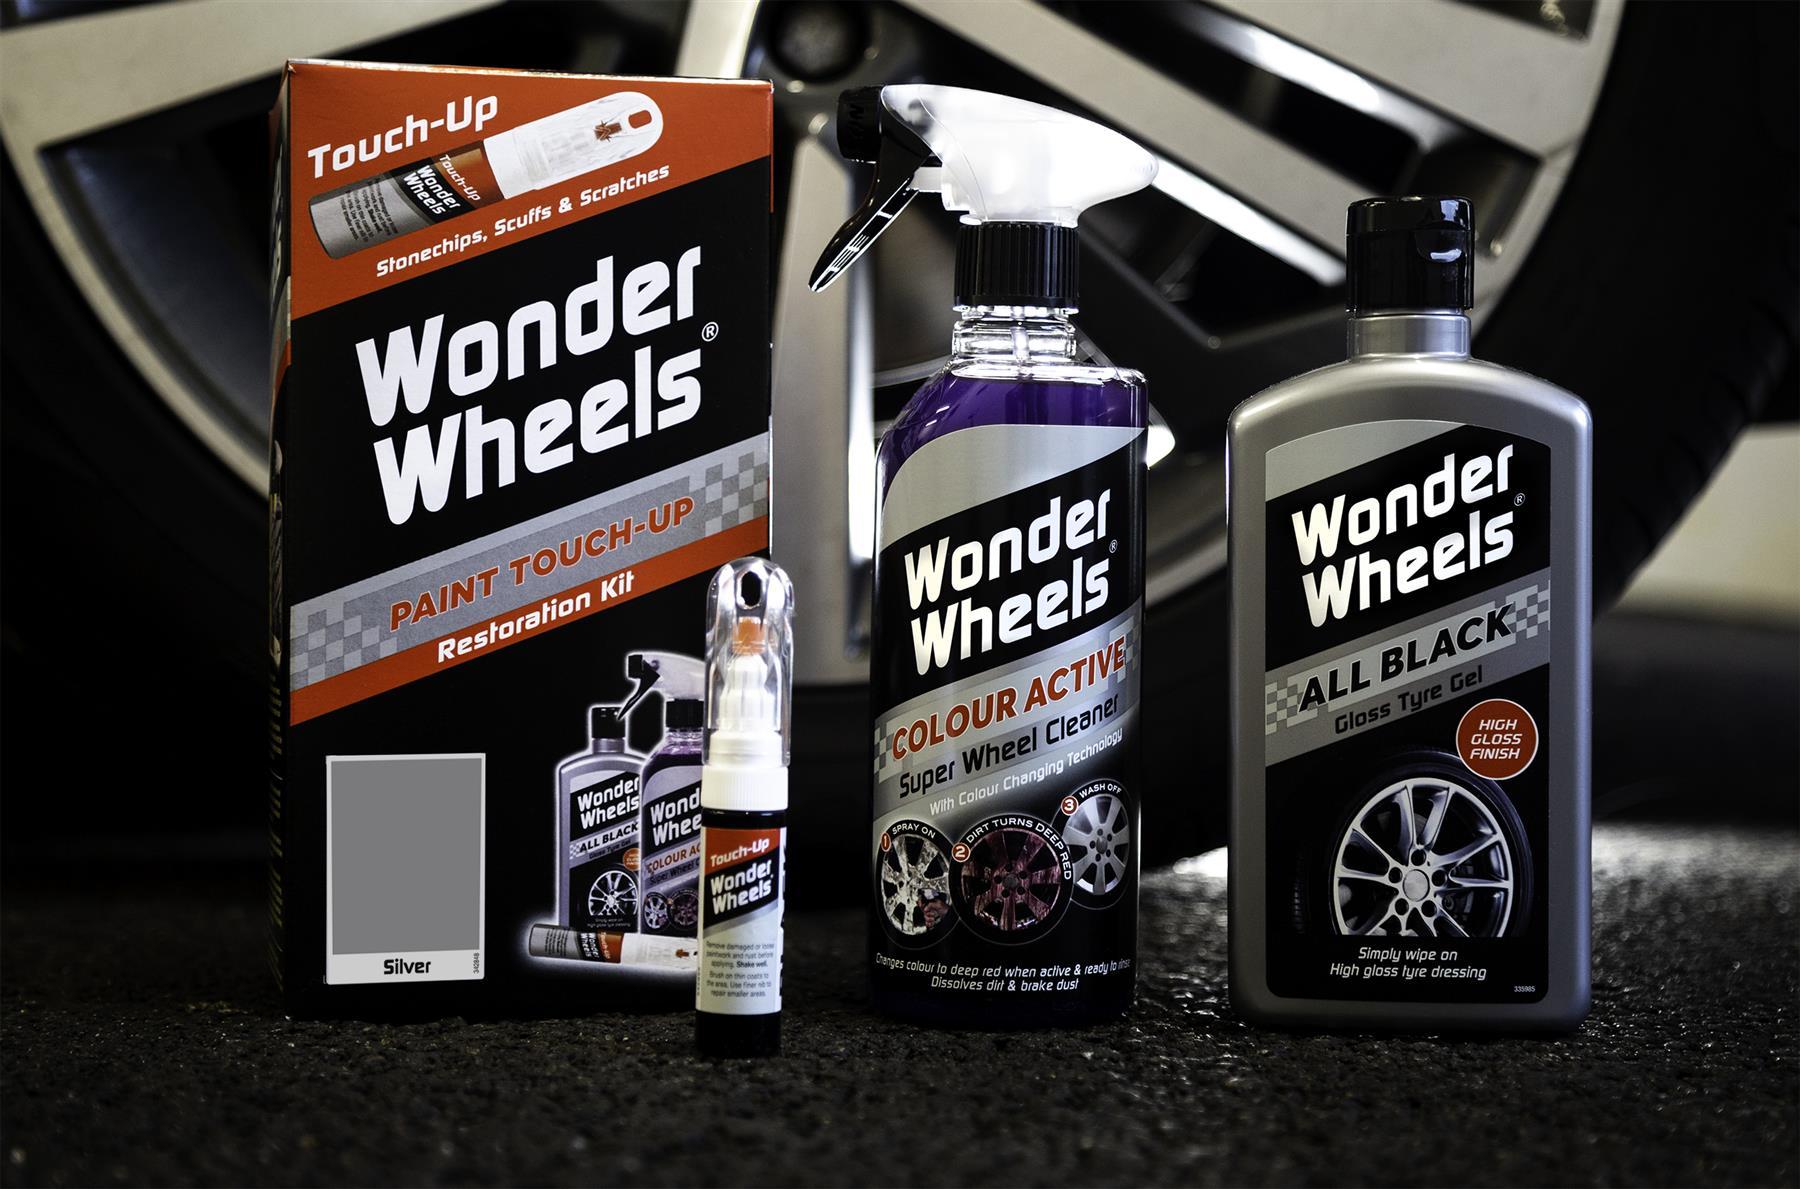 thumbnail 22 - Wonder-Wheels-Paint-Touch-Up-Restoration-Kit